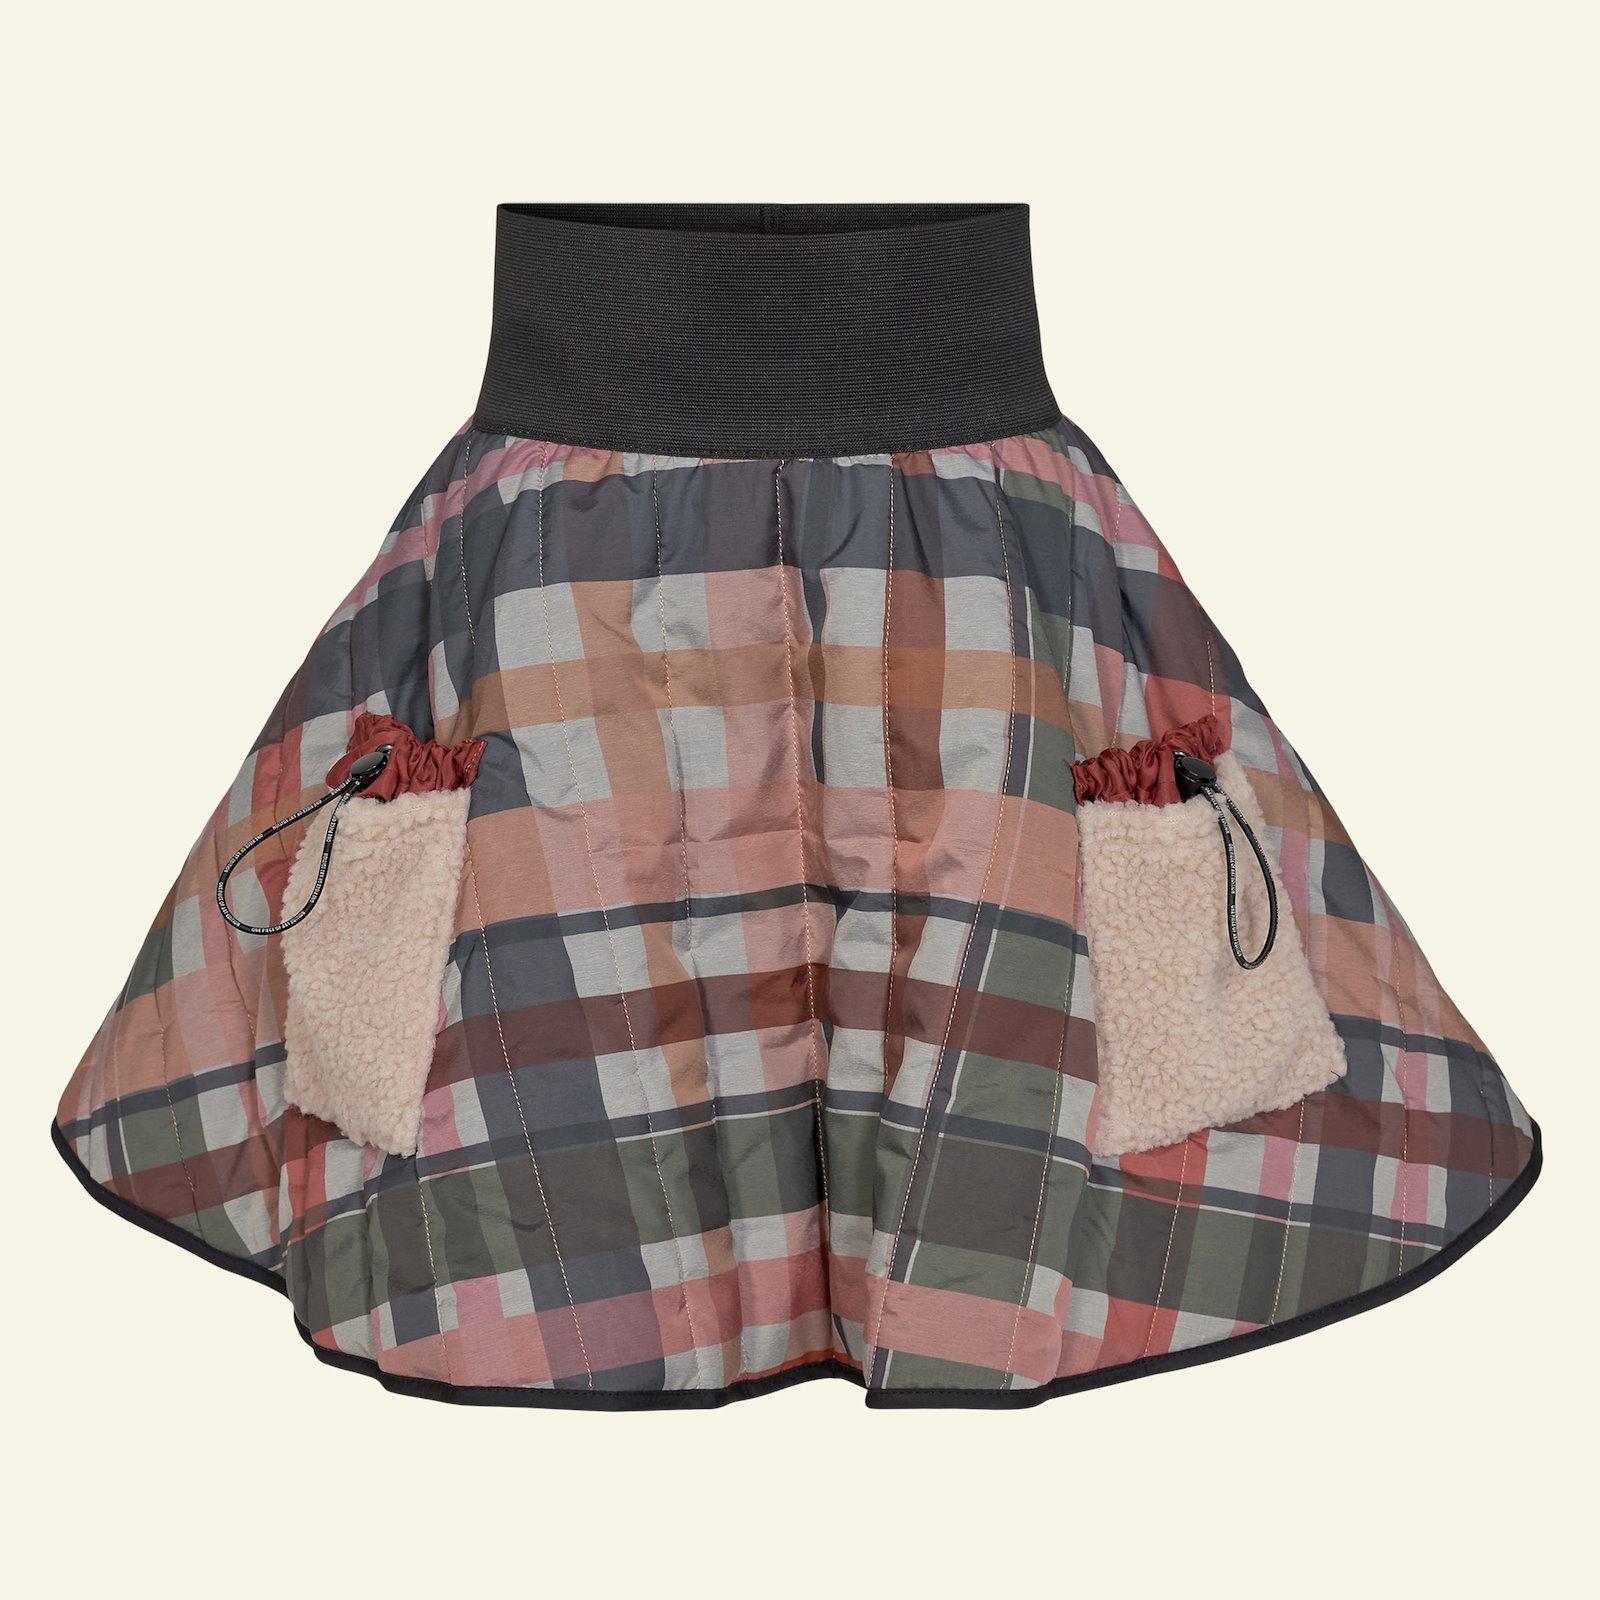 Skirt circular, 104/4y p61019_920227_3509016_64080_910273_8038_3509073_45705_sskit